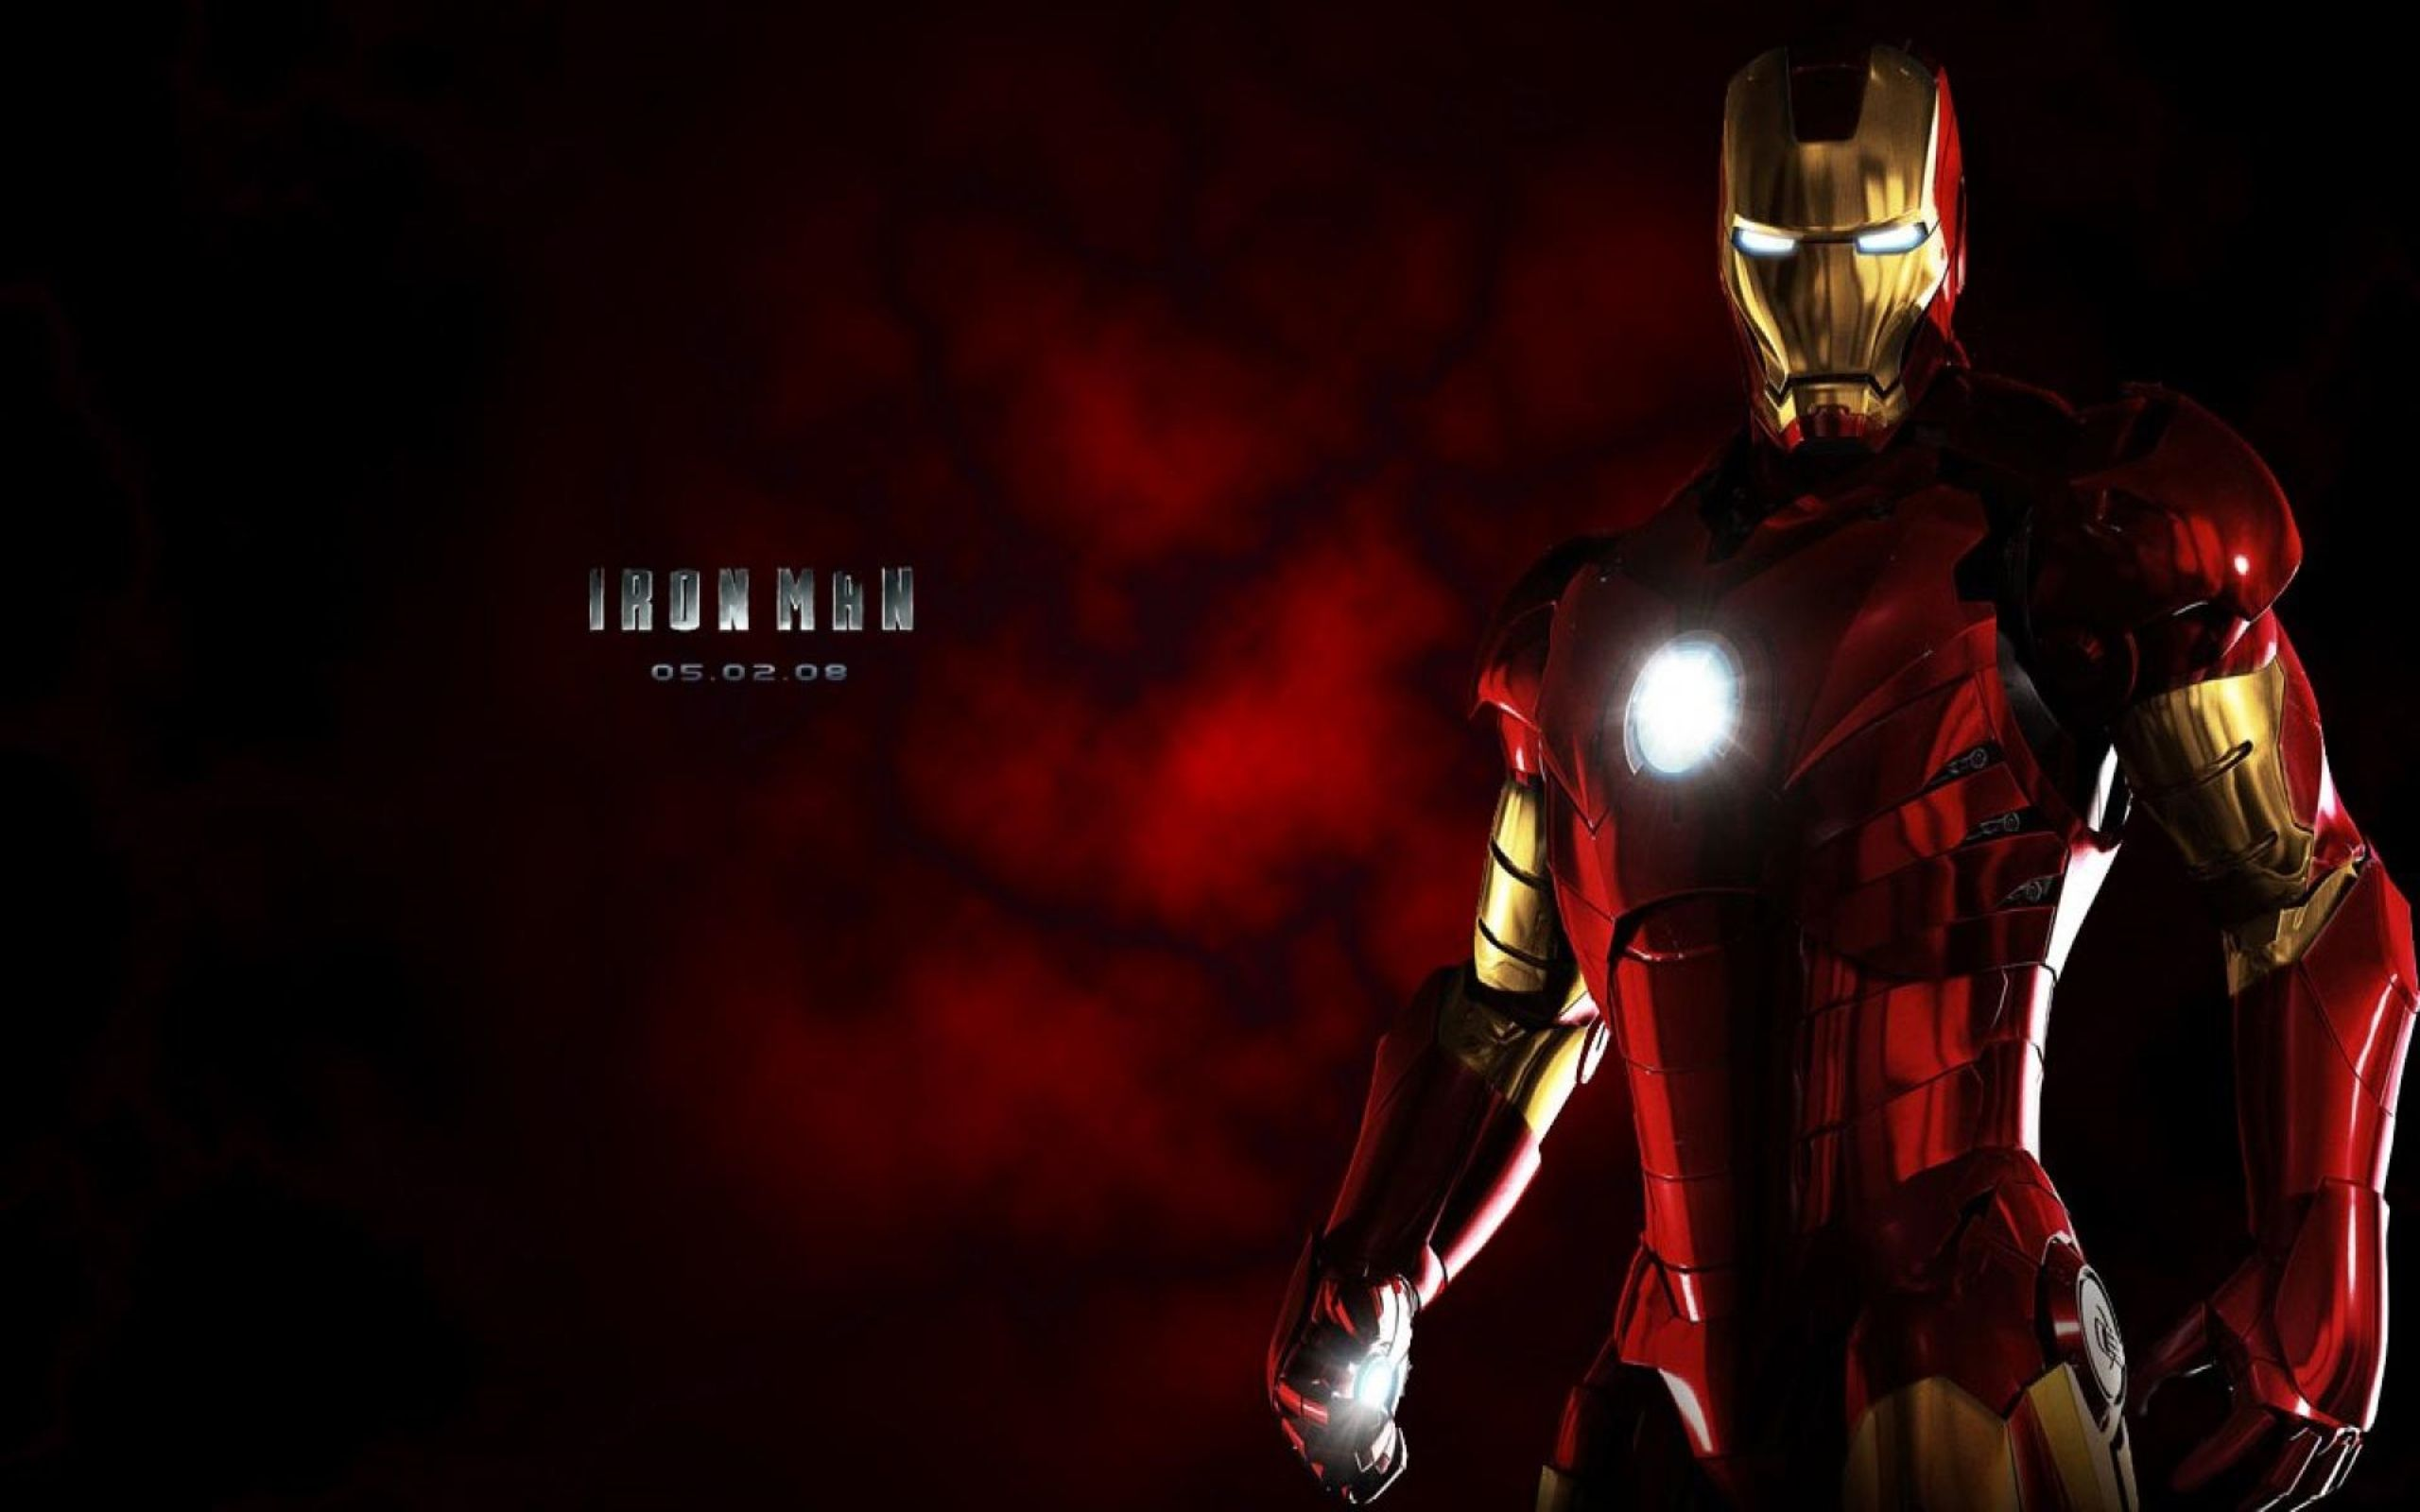 iron man hd pics